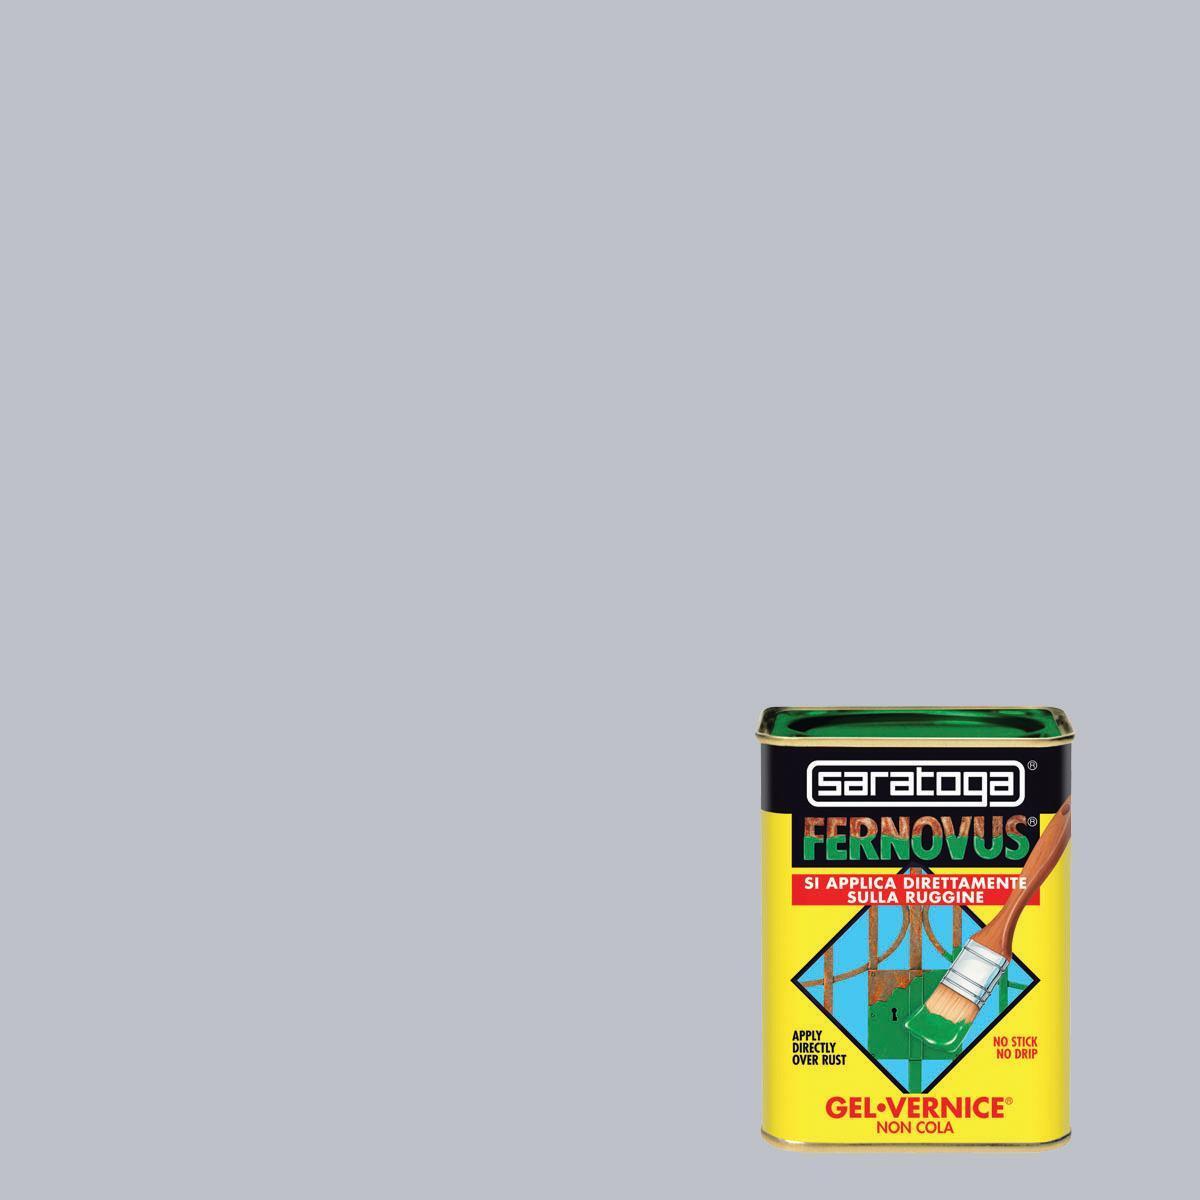 Smalto antiruggine SARATOGA Fernovus grigio perla 0.05 L - 6